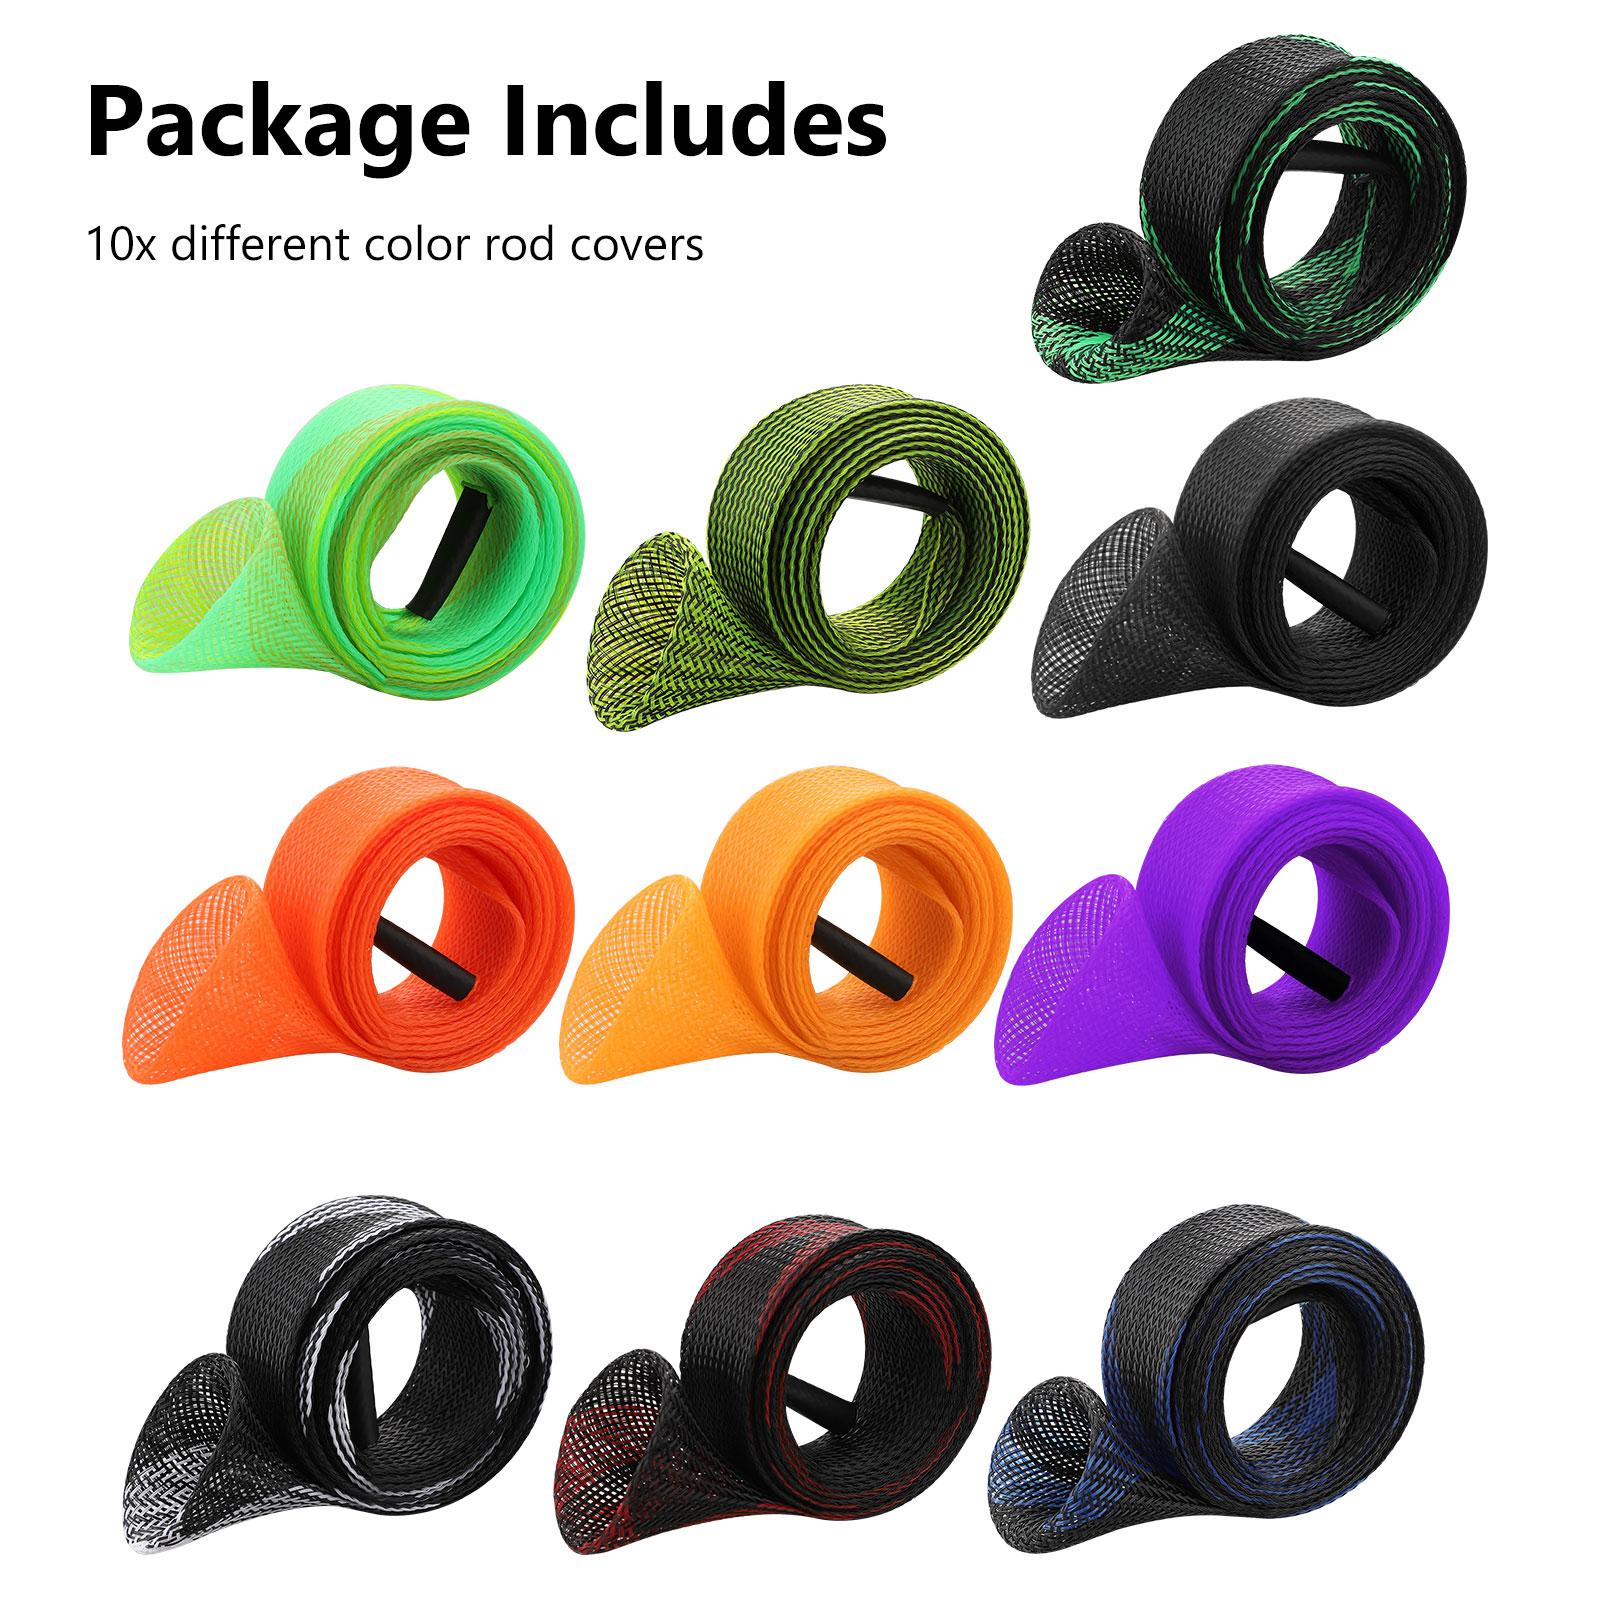 10Pcs-67-039-039-Fishing-Spinning-Rod-Sock-Covers-Braided-Mesh-Rod-Protector-Sleeve-US thumbnail 8